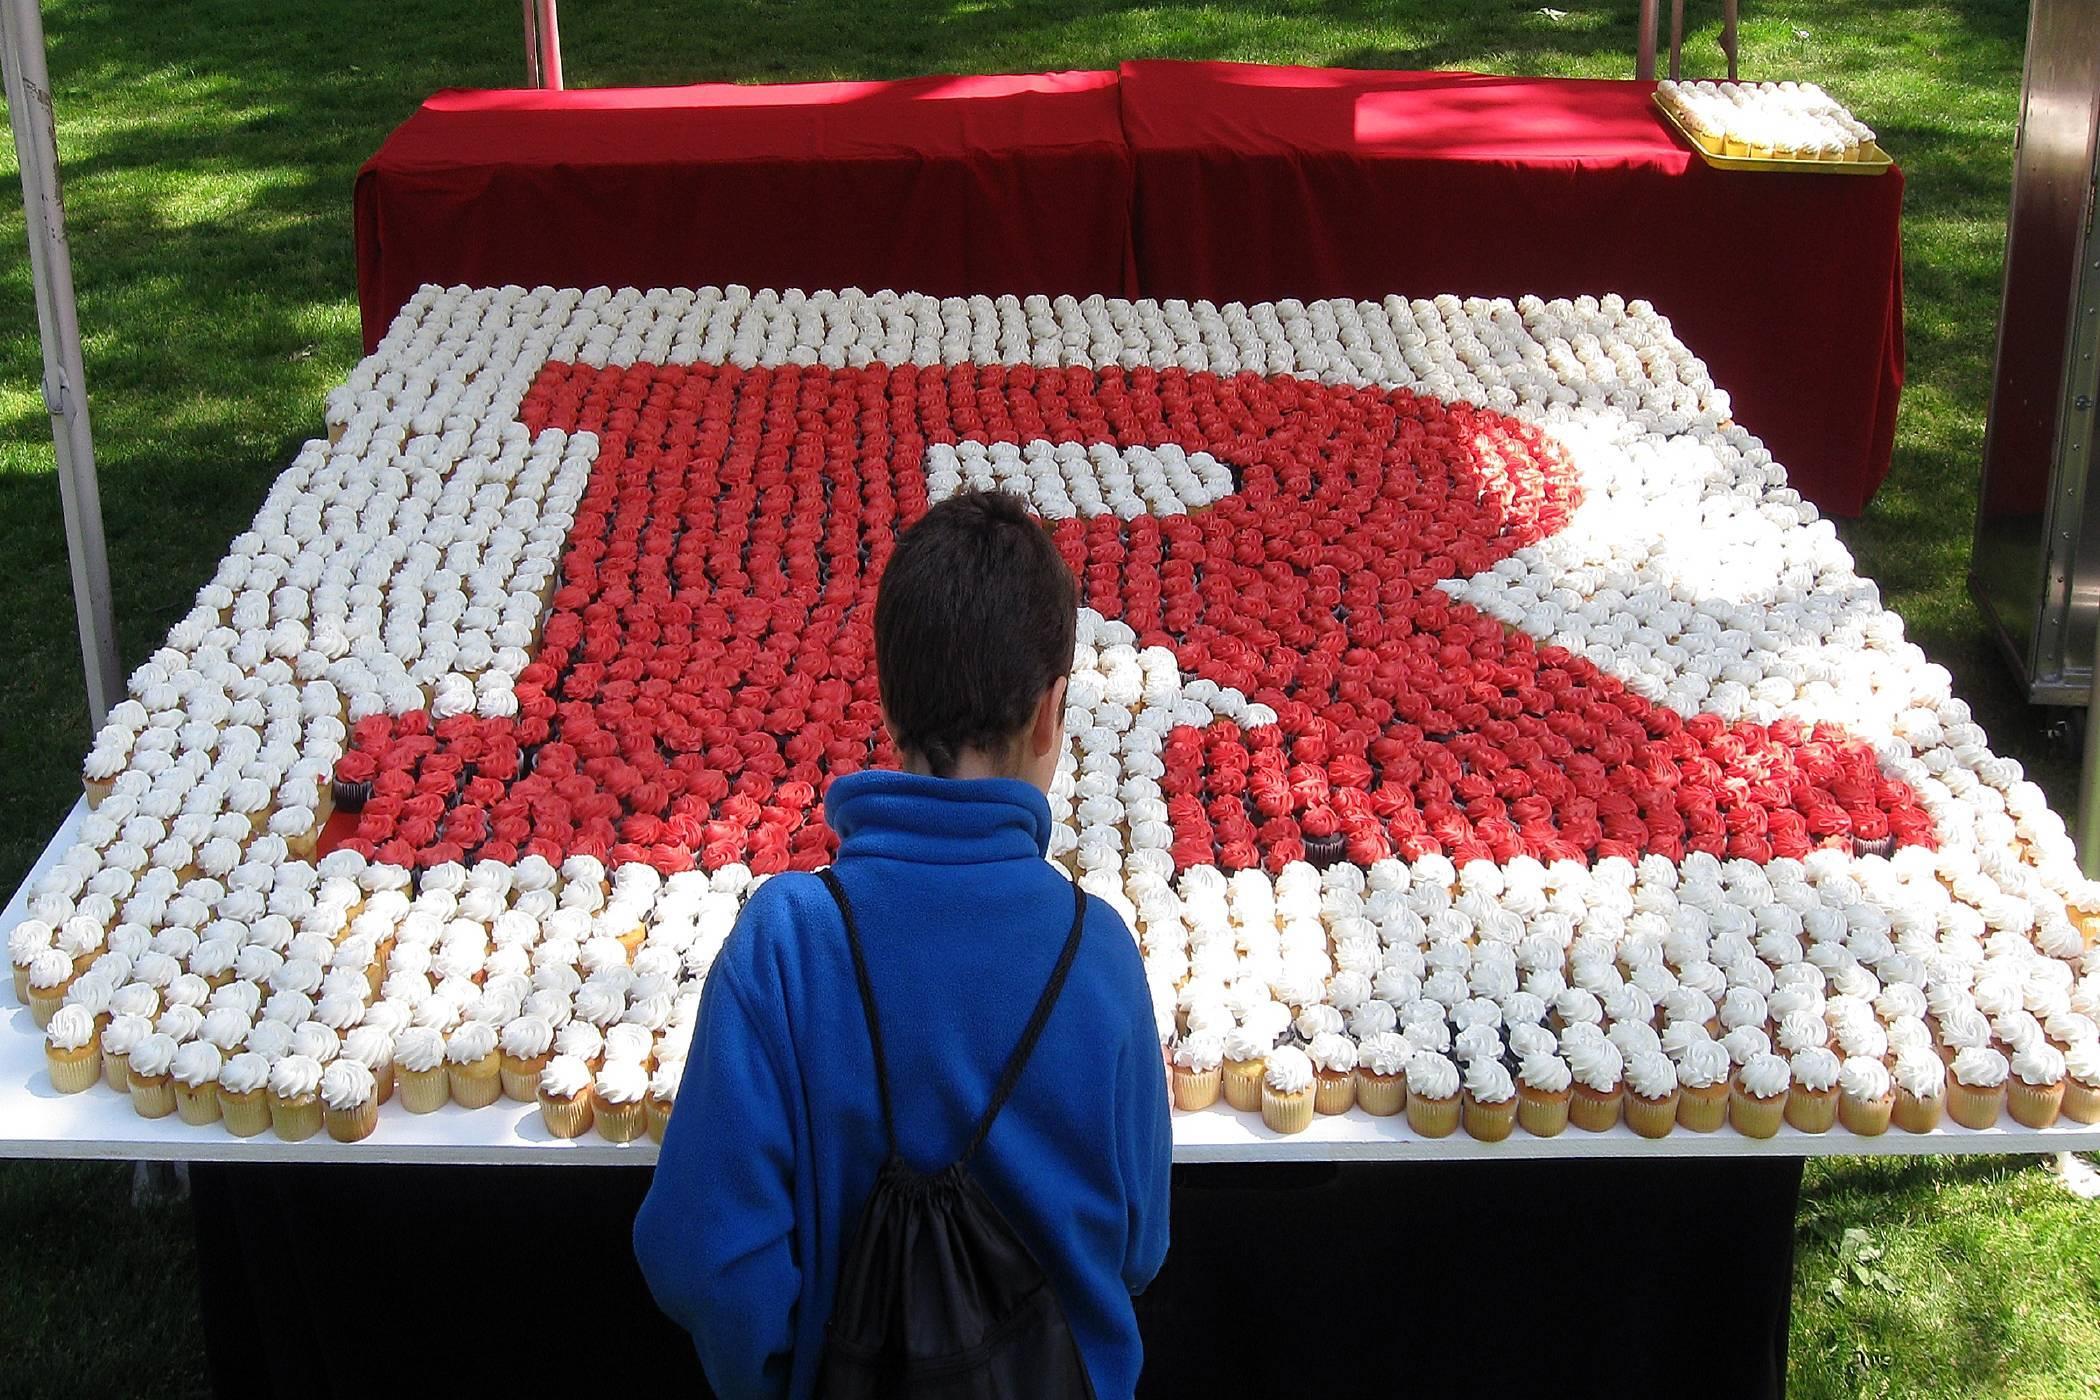 699b91a9d3780eae0111_RutgersDay1-highres.jpg